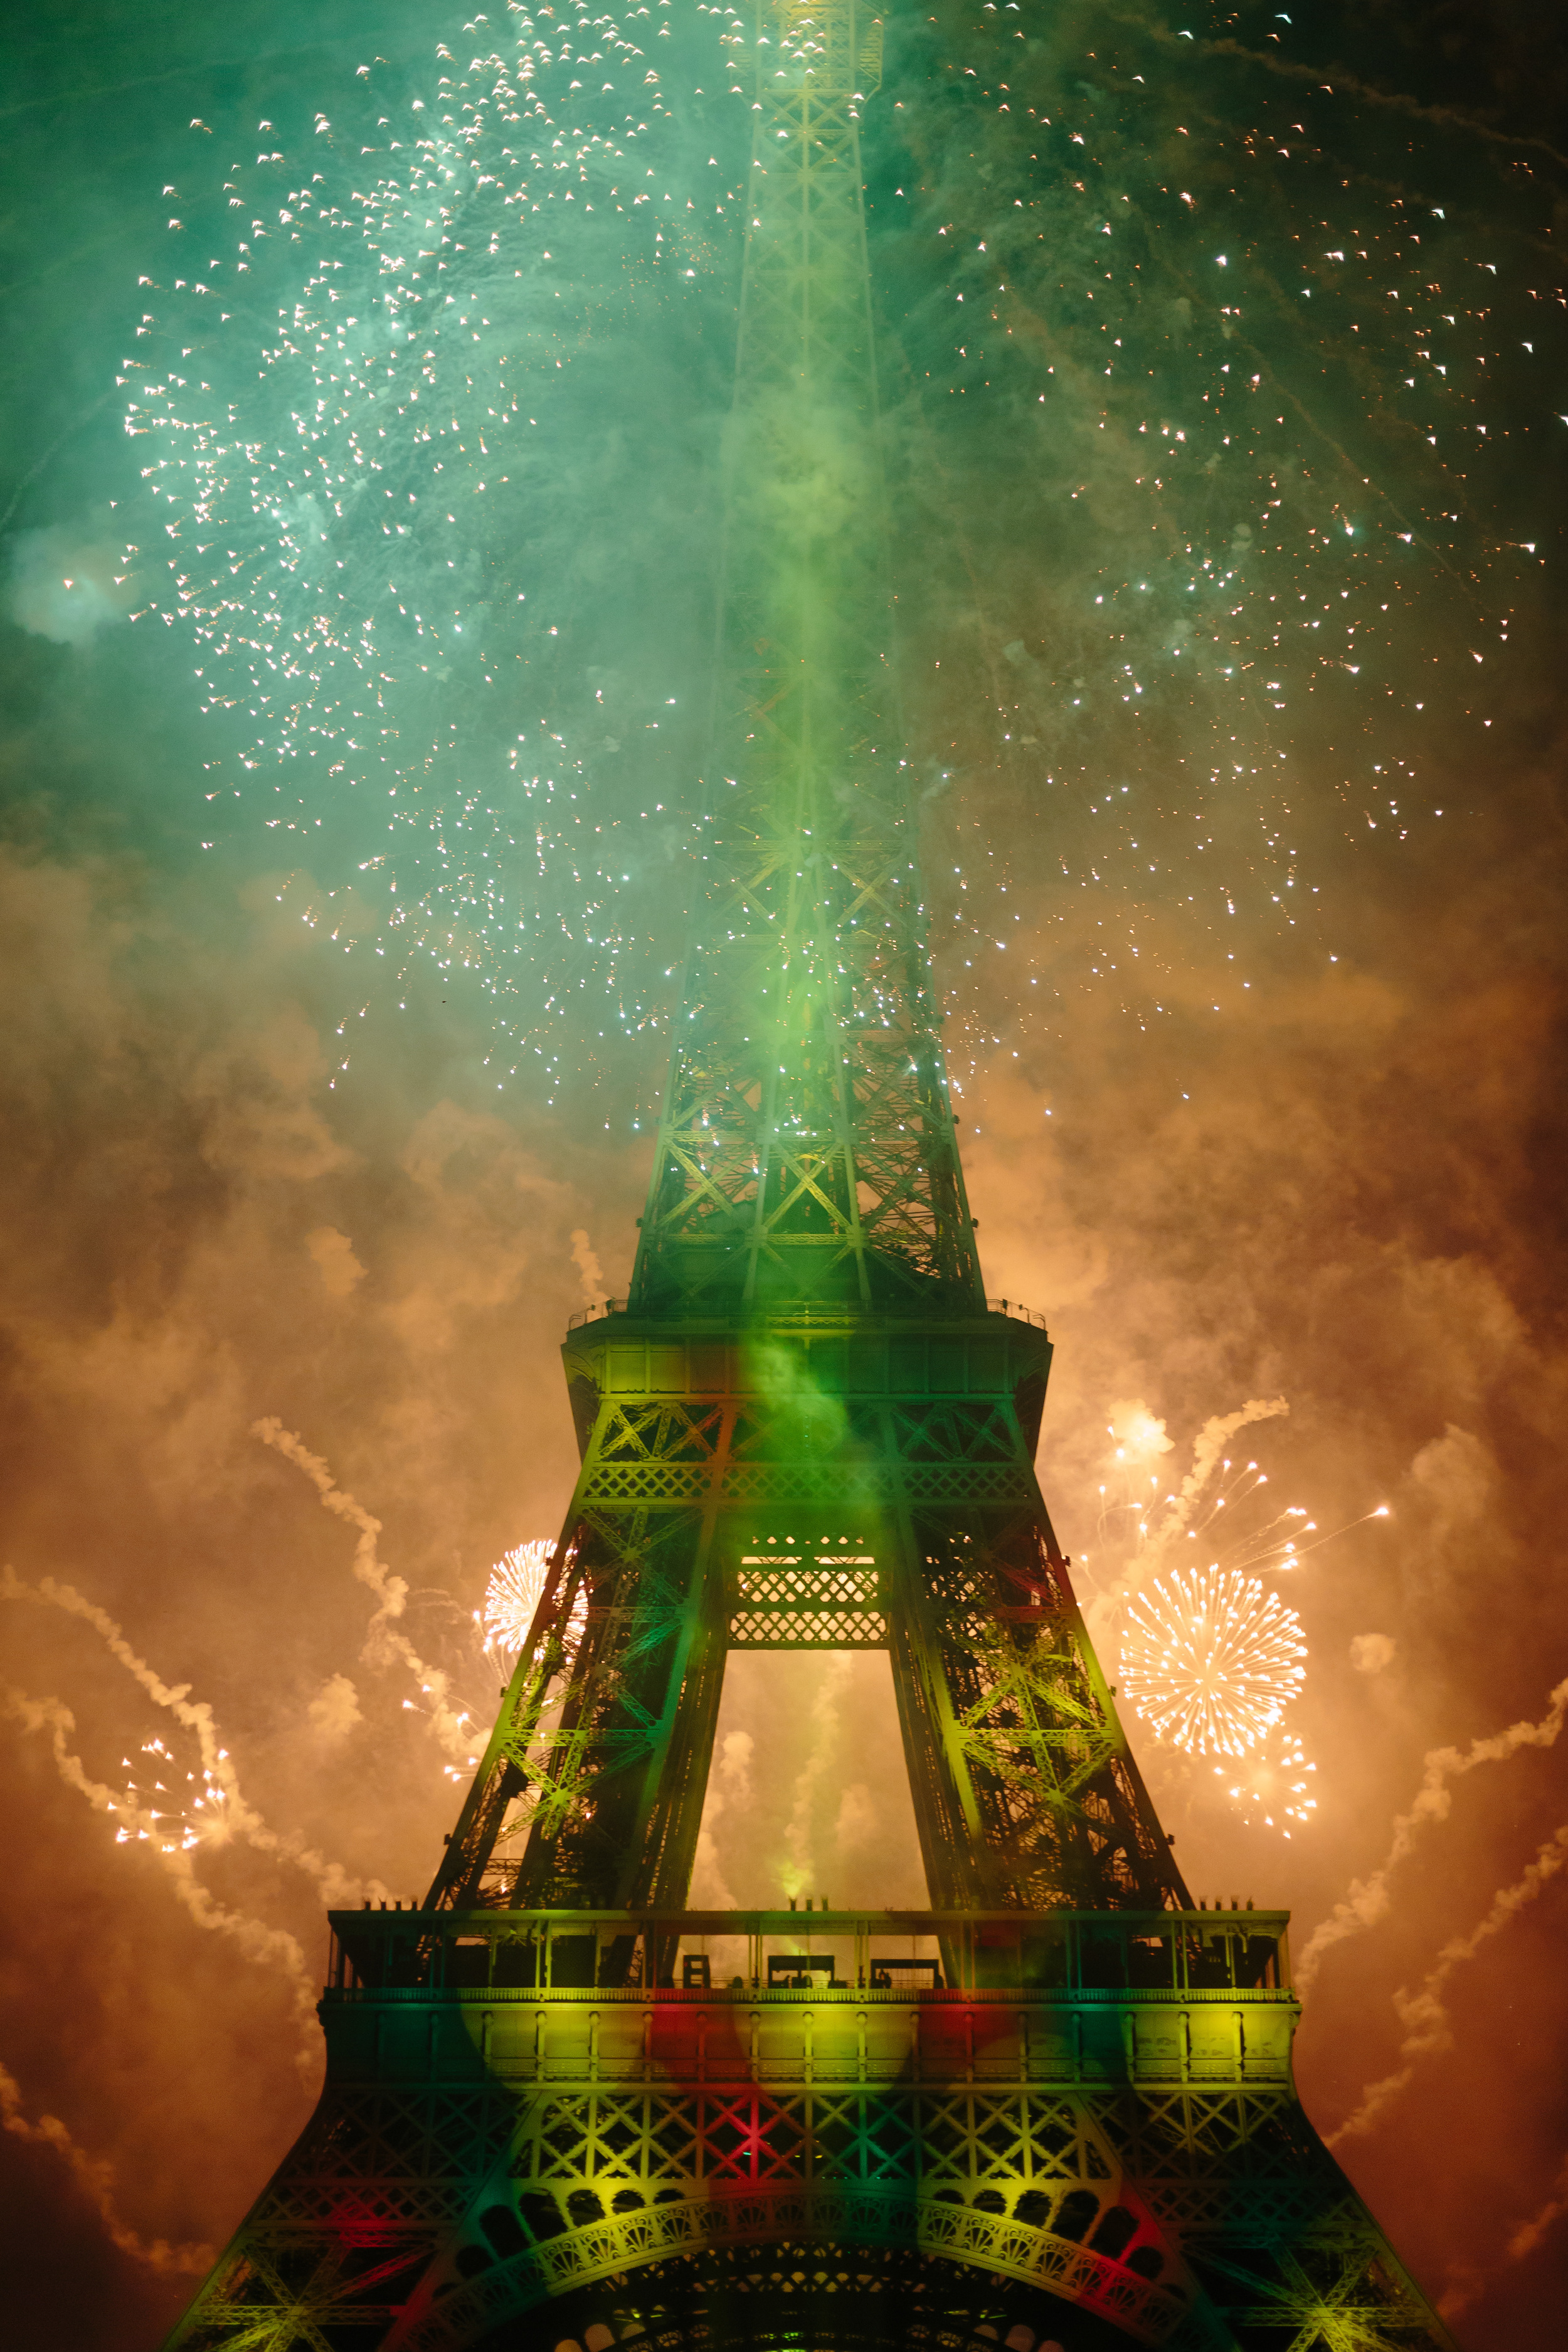 Paris Photographer 14 July Bastille day Eiffel Tower Iheartparisfr